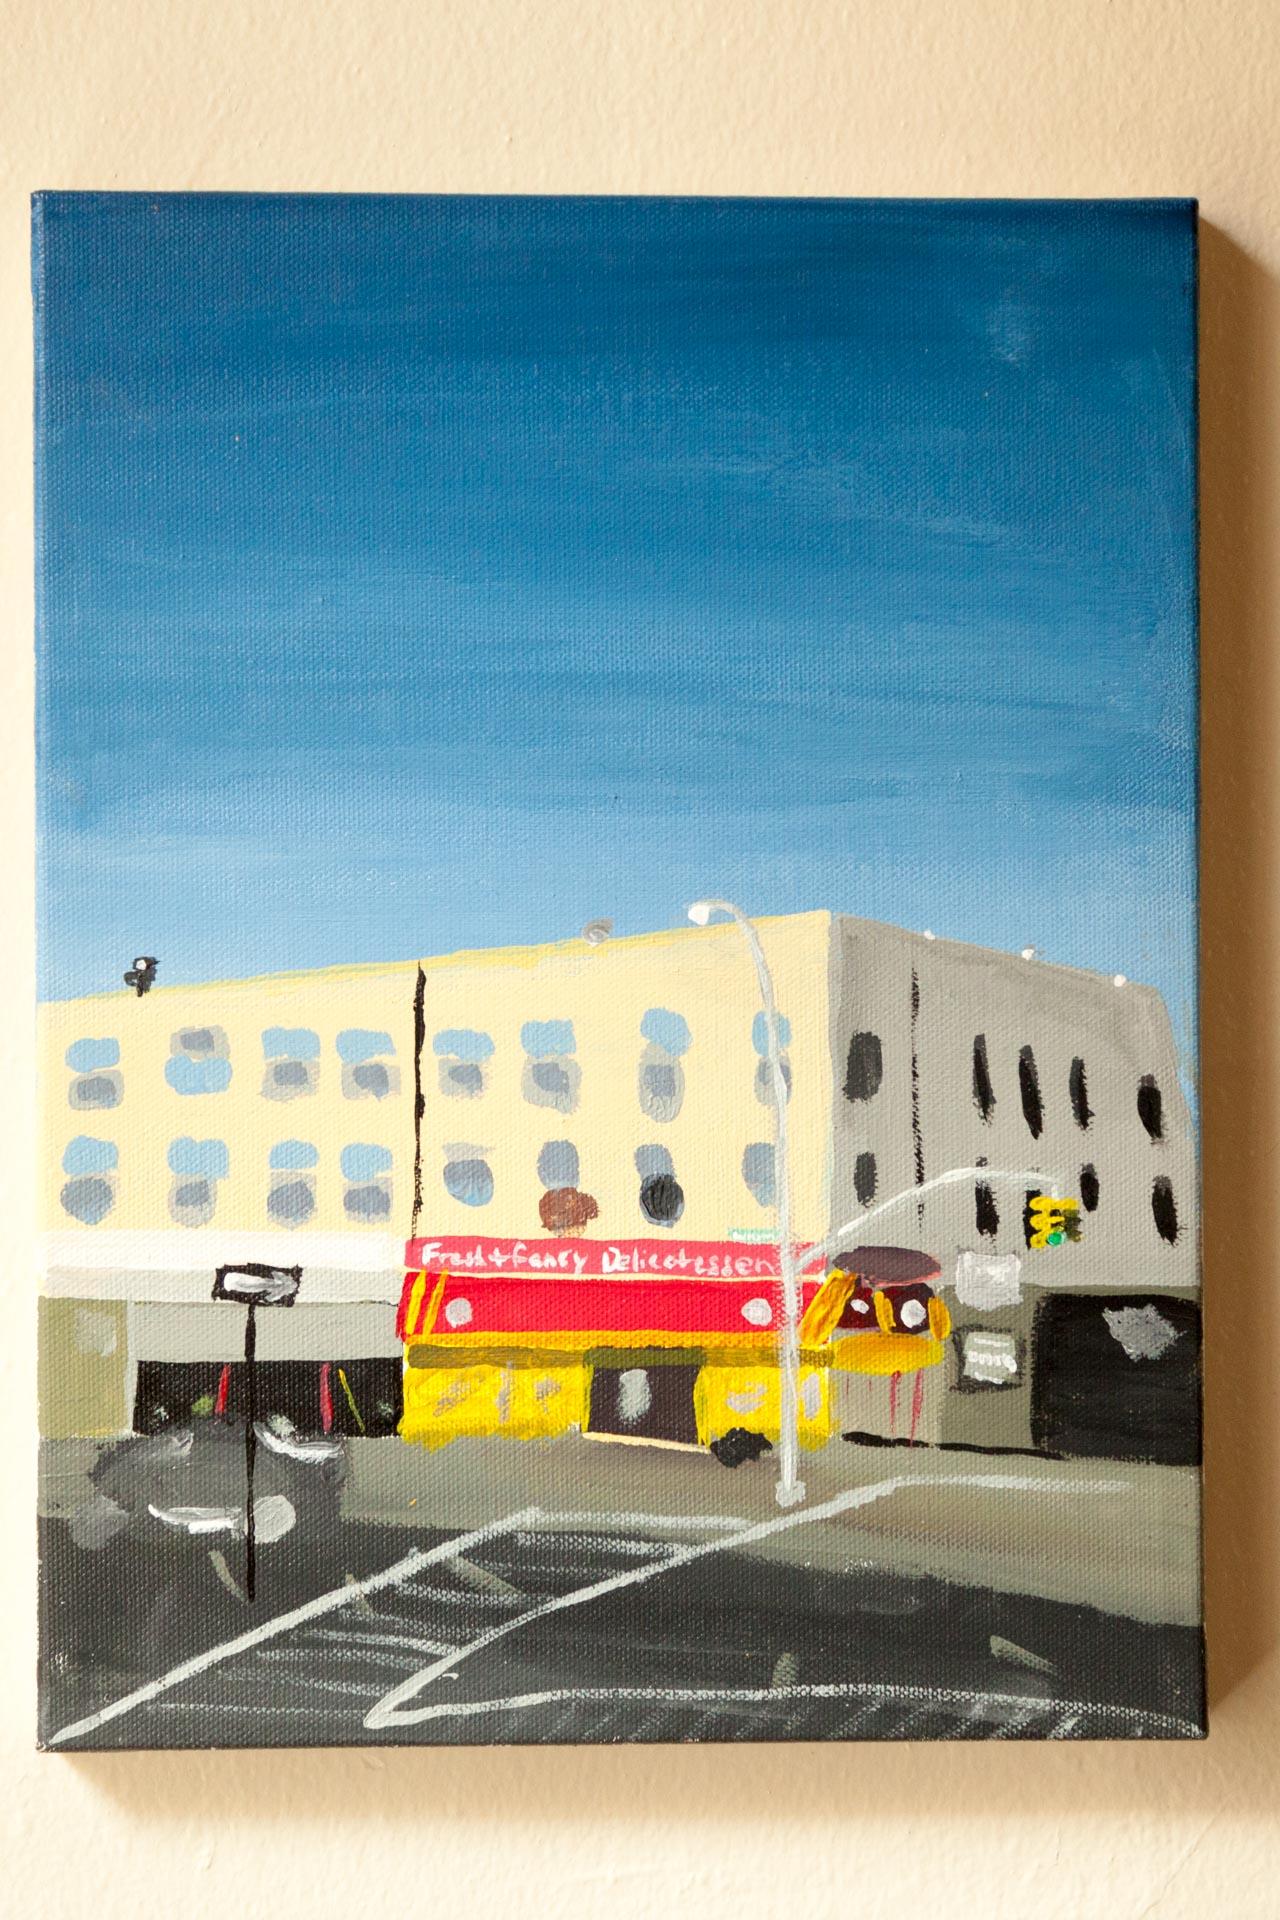 "Fresh & Fancy Deli, Starr St., Acrylic on Canvas, 8""x10"", 2015"